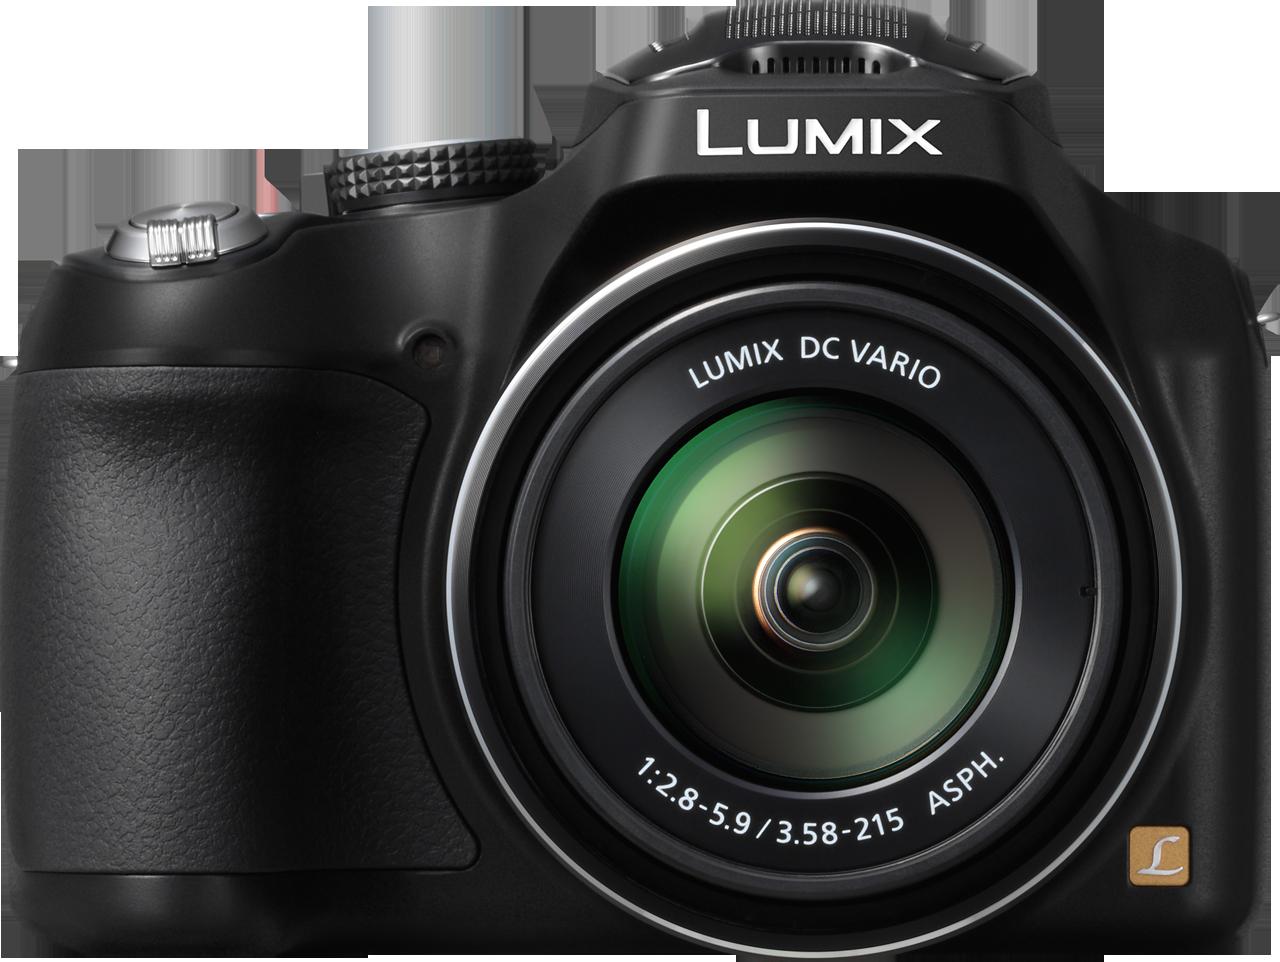 Panasonic Lumix Dmc Fz70 Digital Photography Review